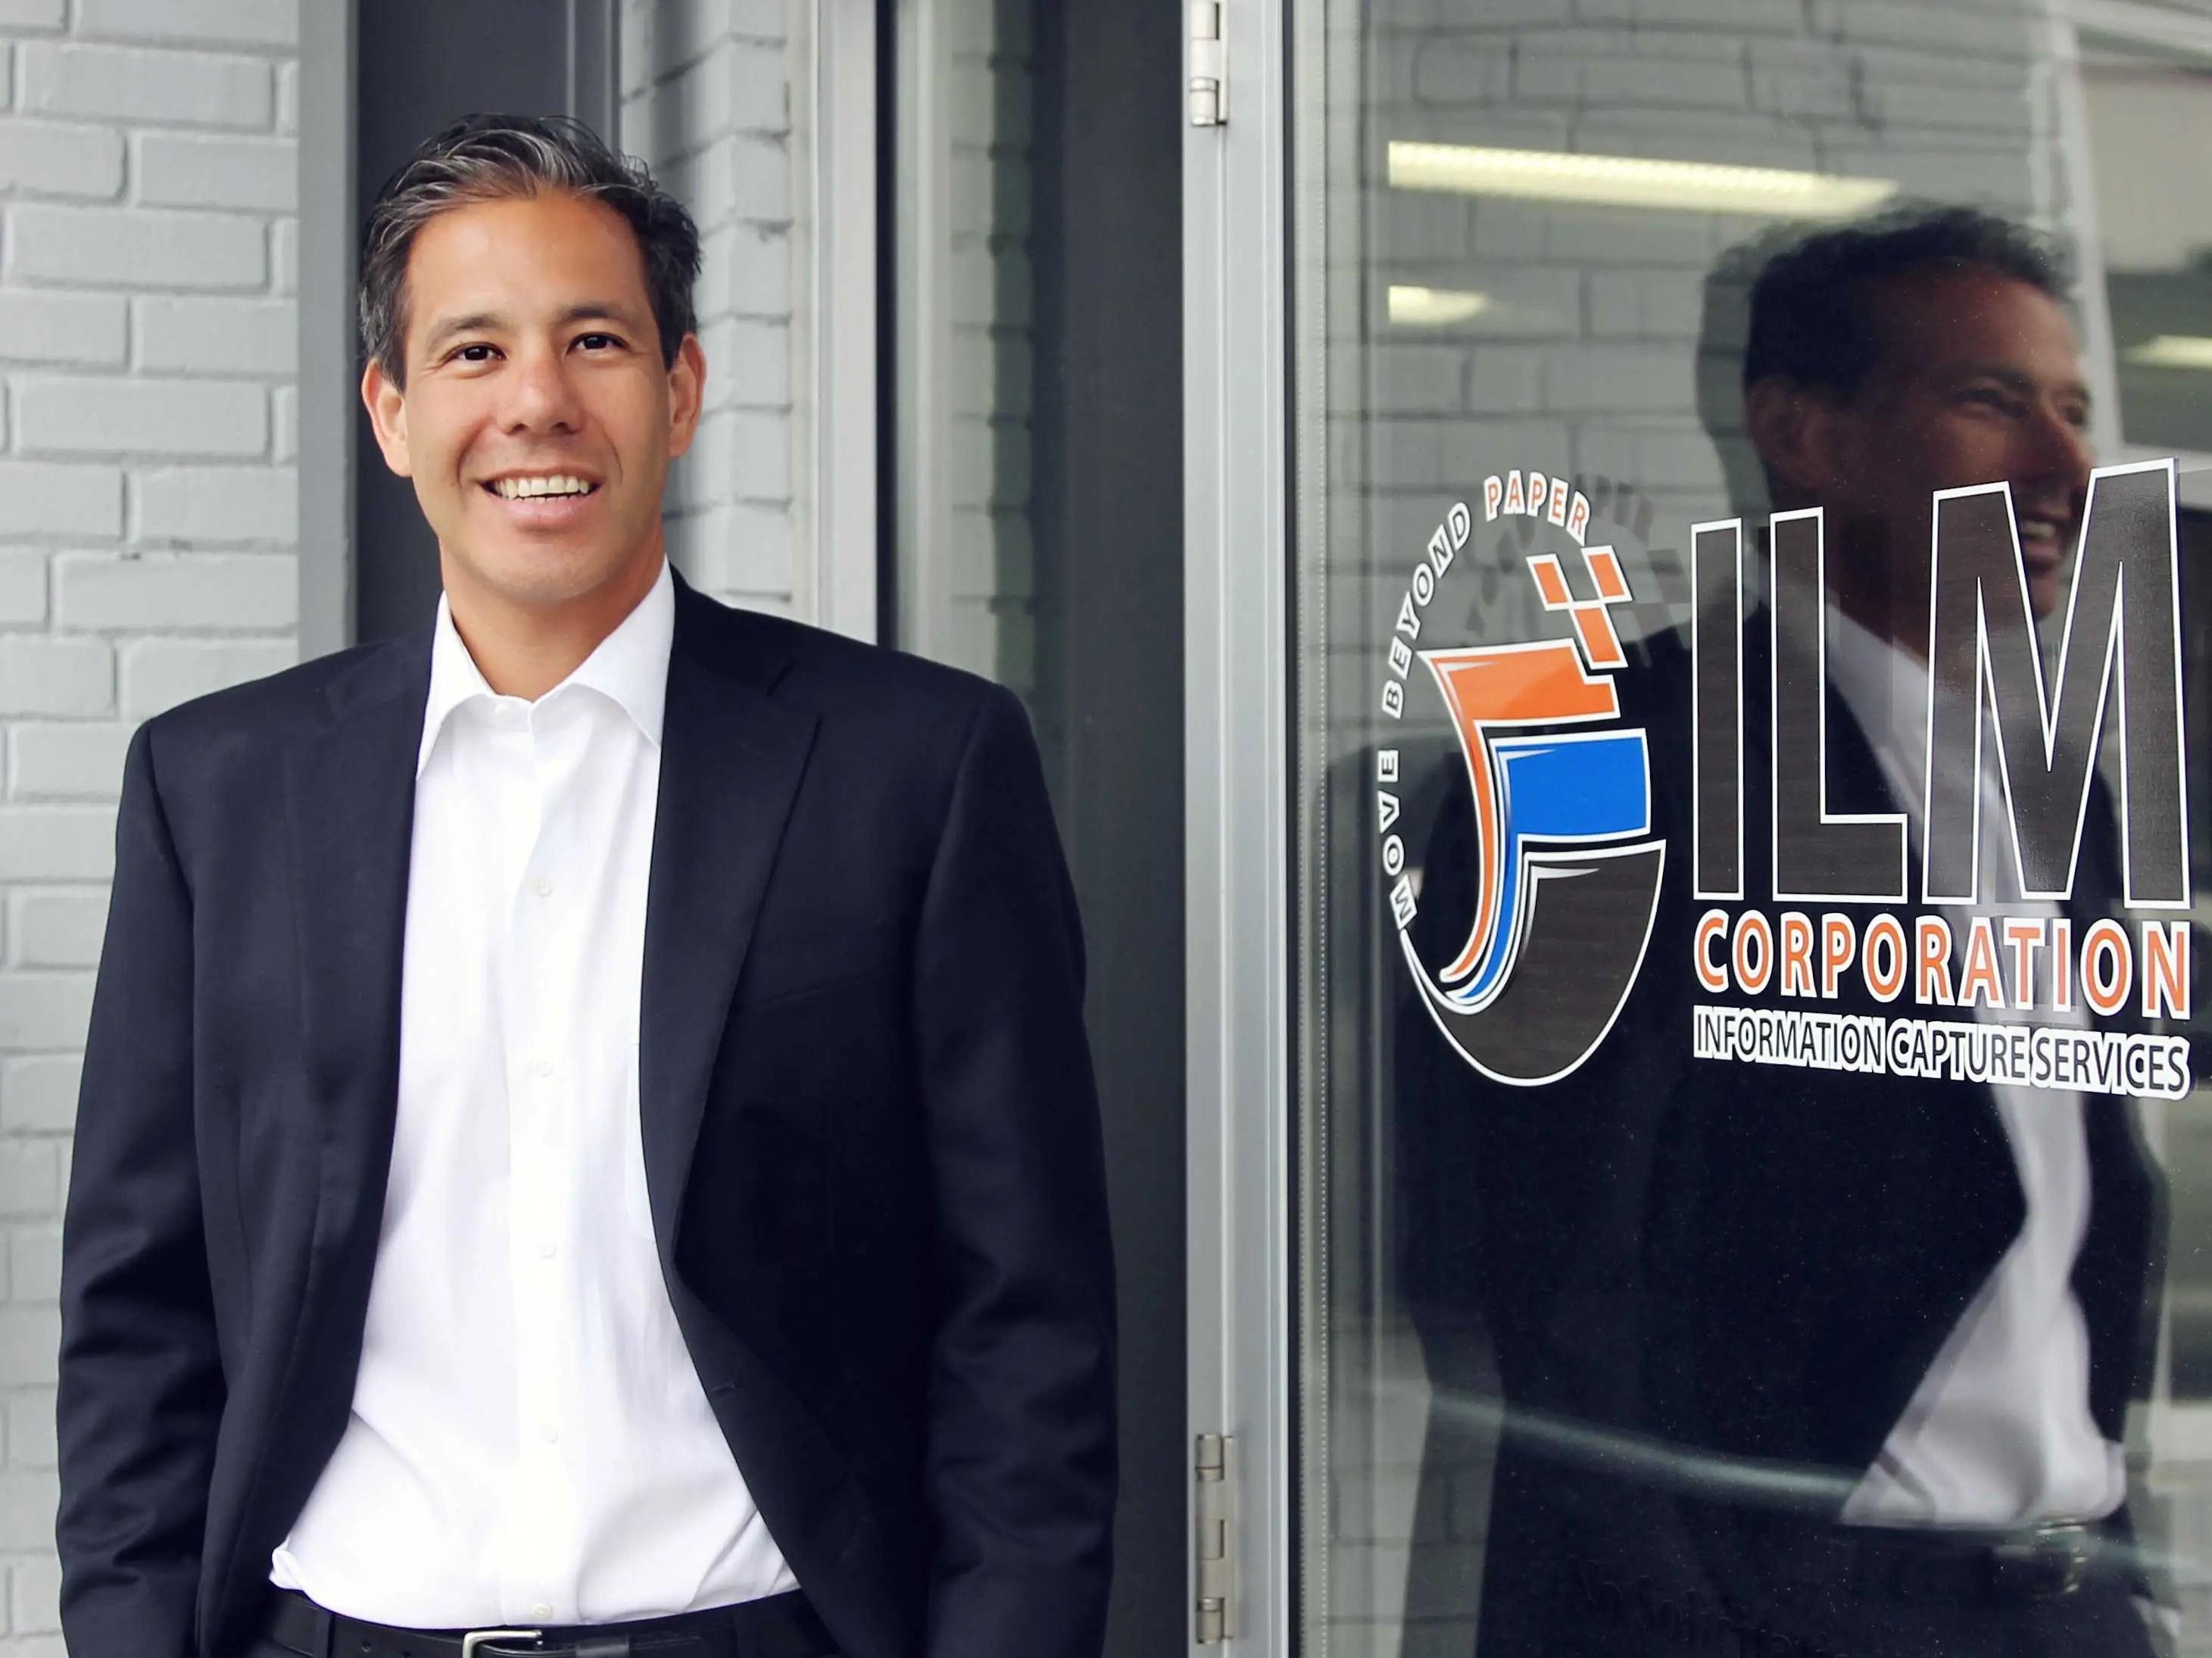 VIRGINIA: Jason Cohen, President ILM Corporation